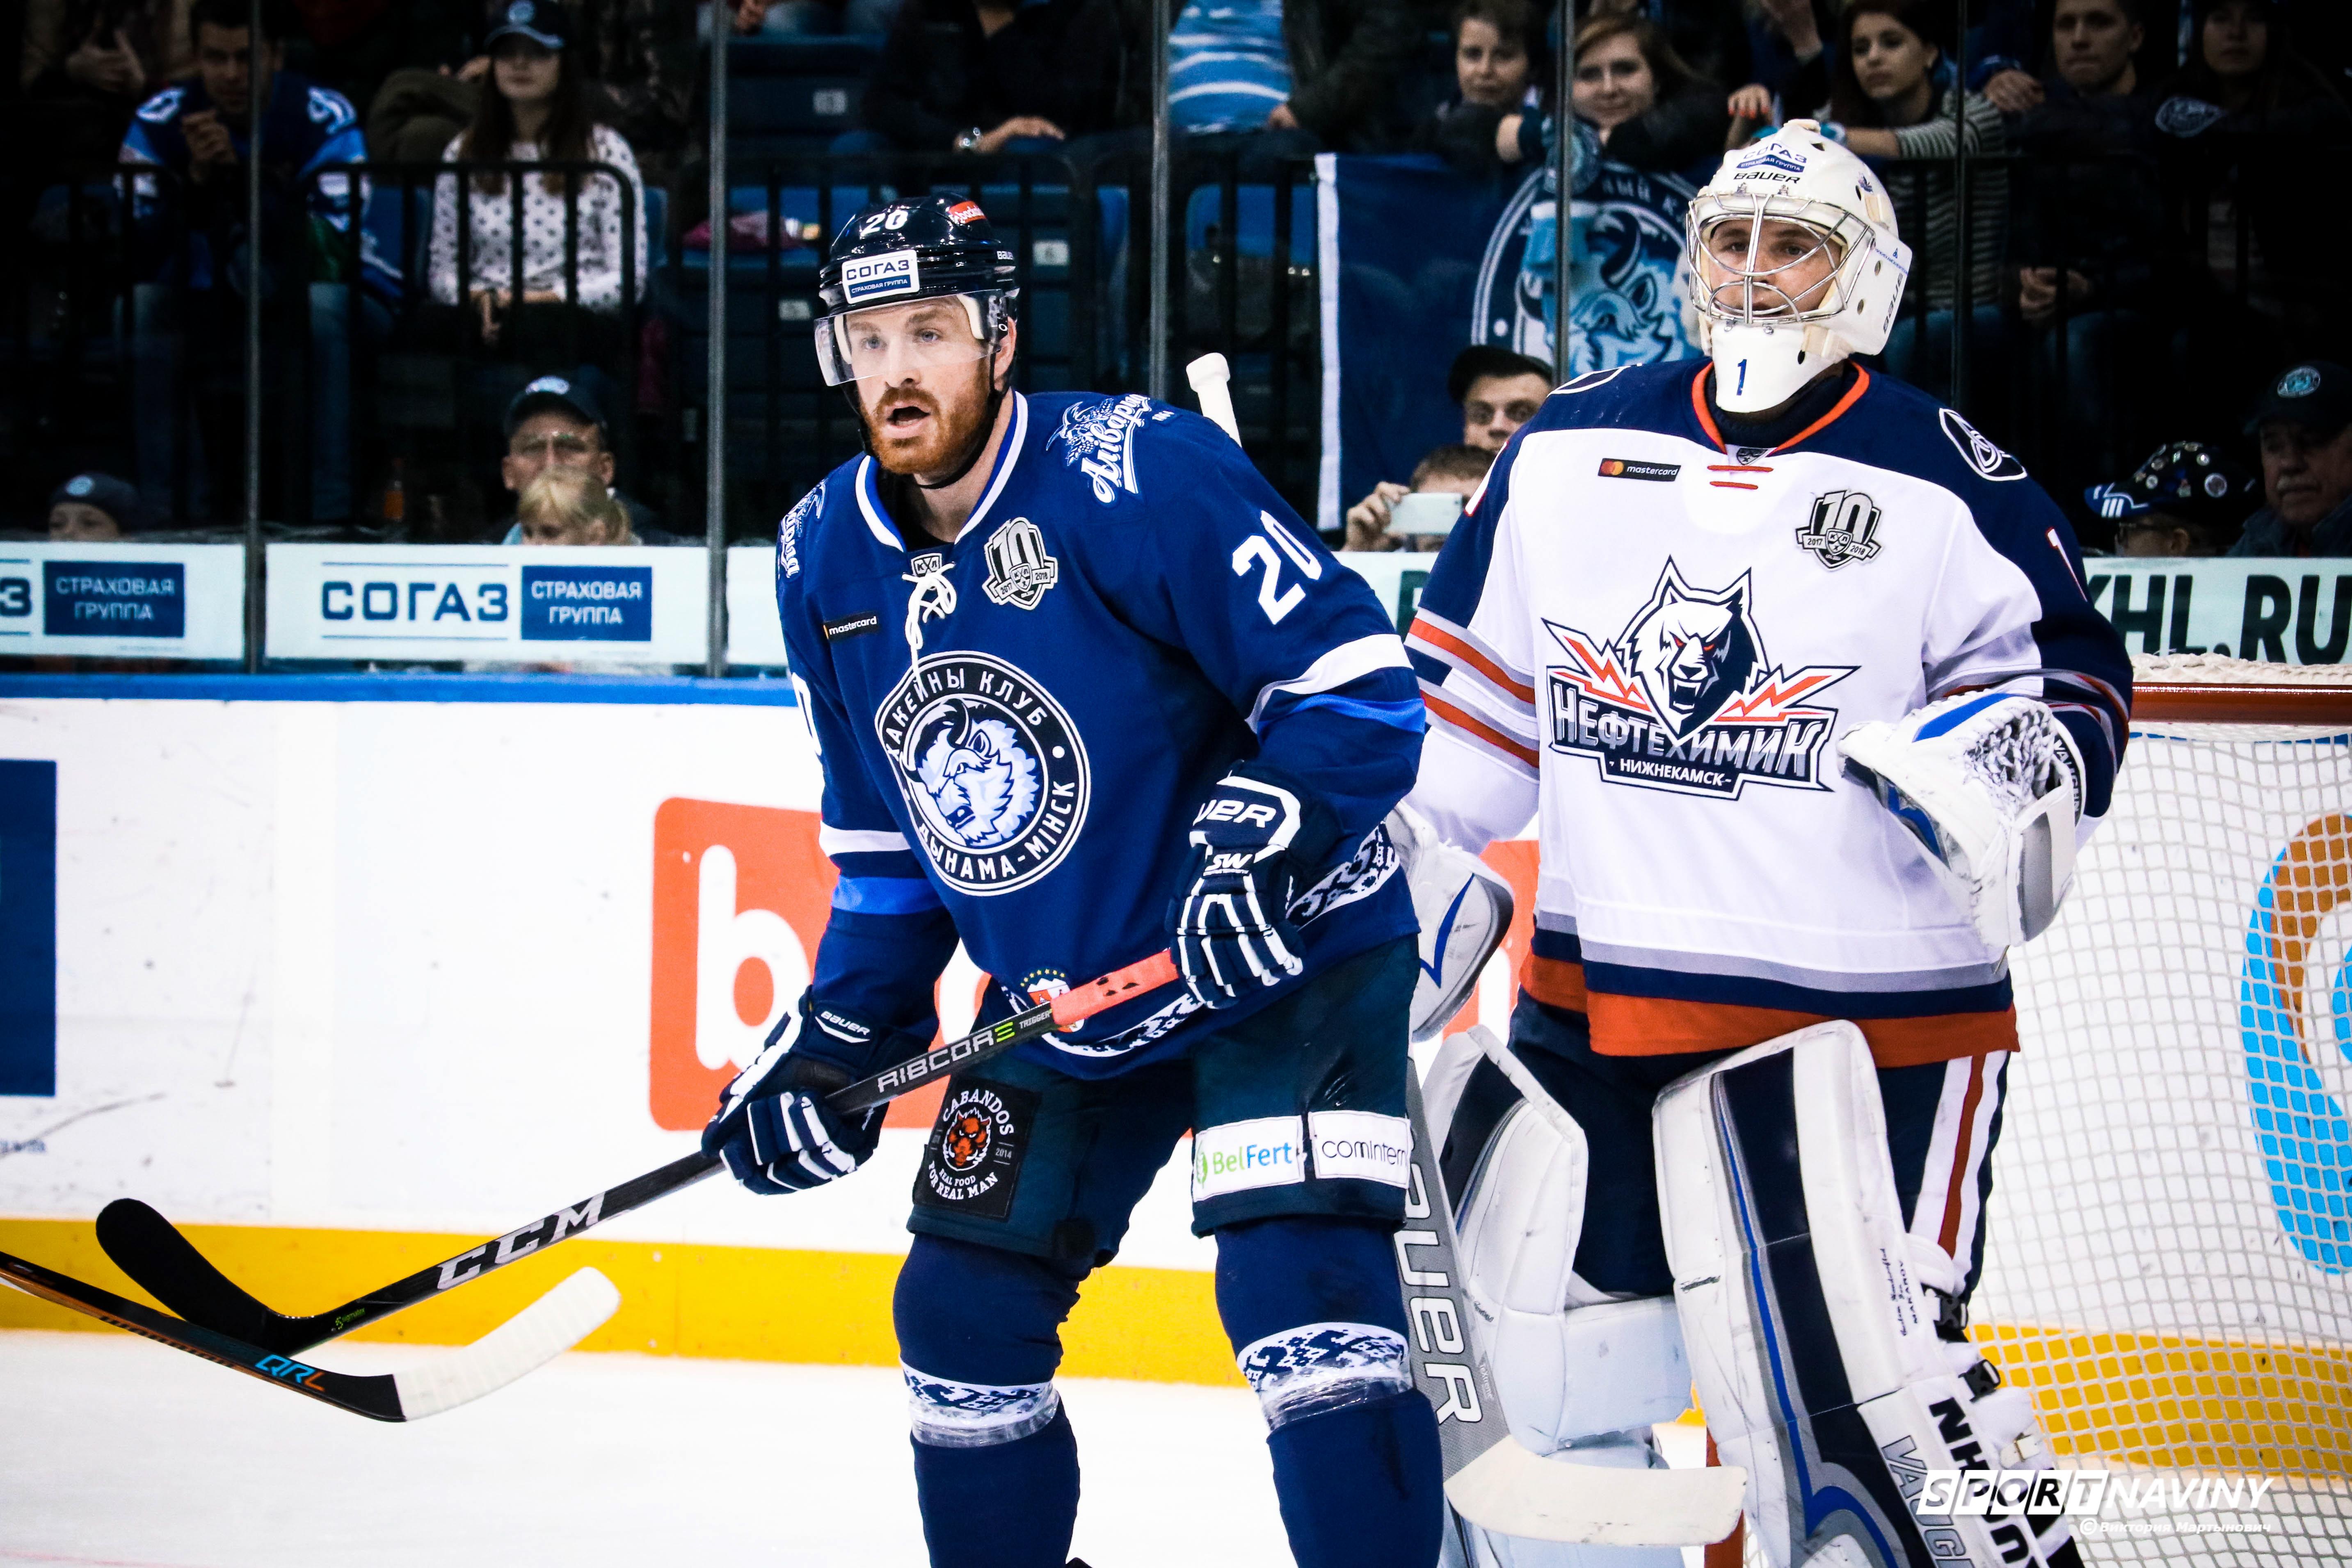 HC Dinamo-Minsk 3:1 HC Neftehimik. 13/10/2017